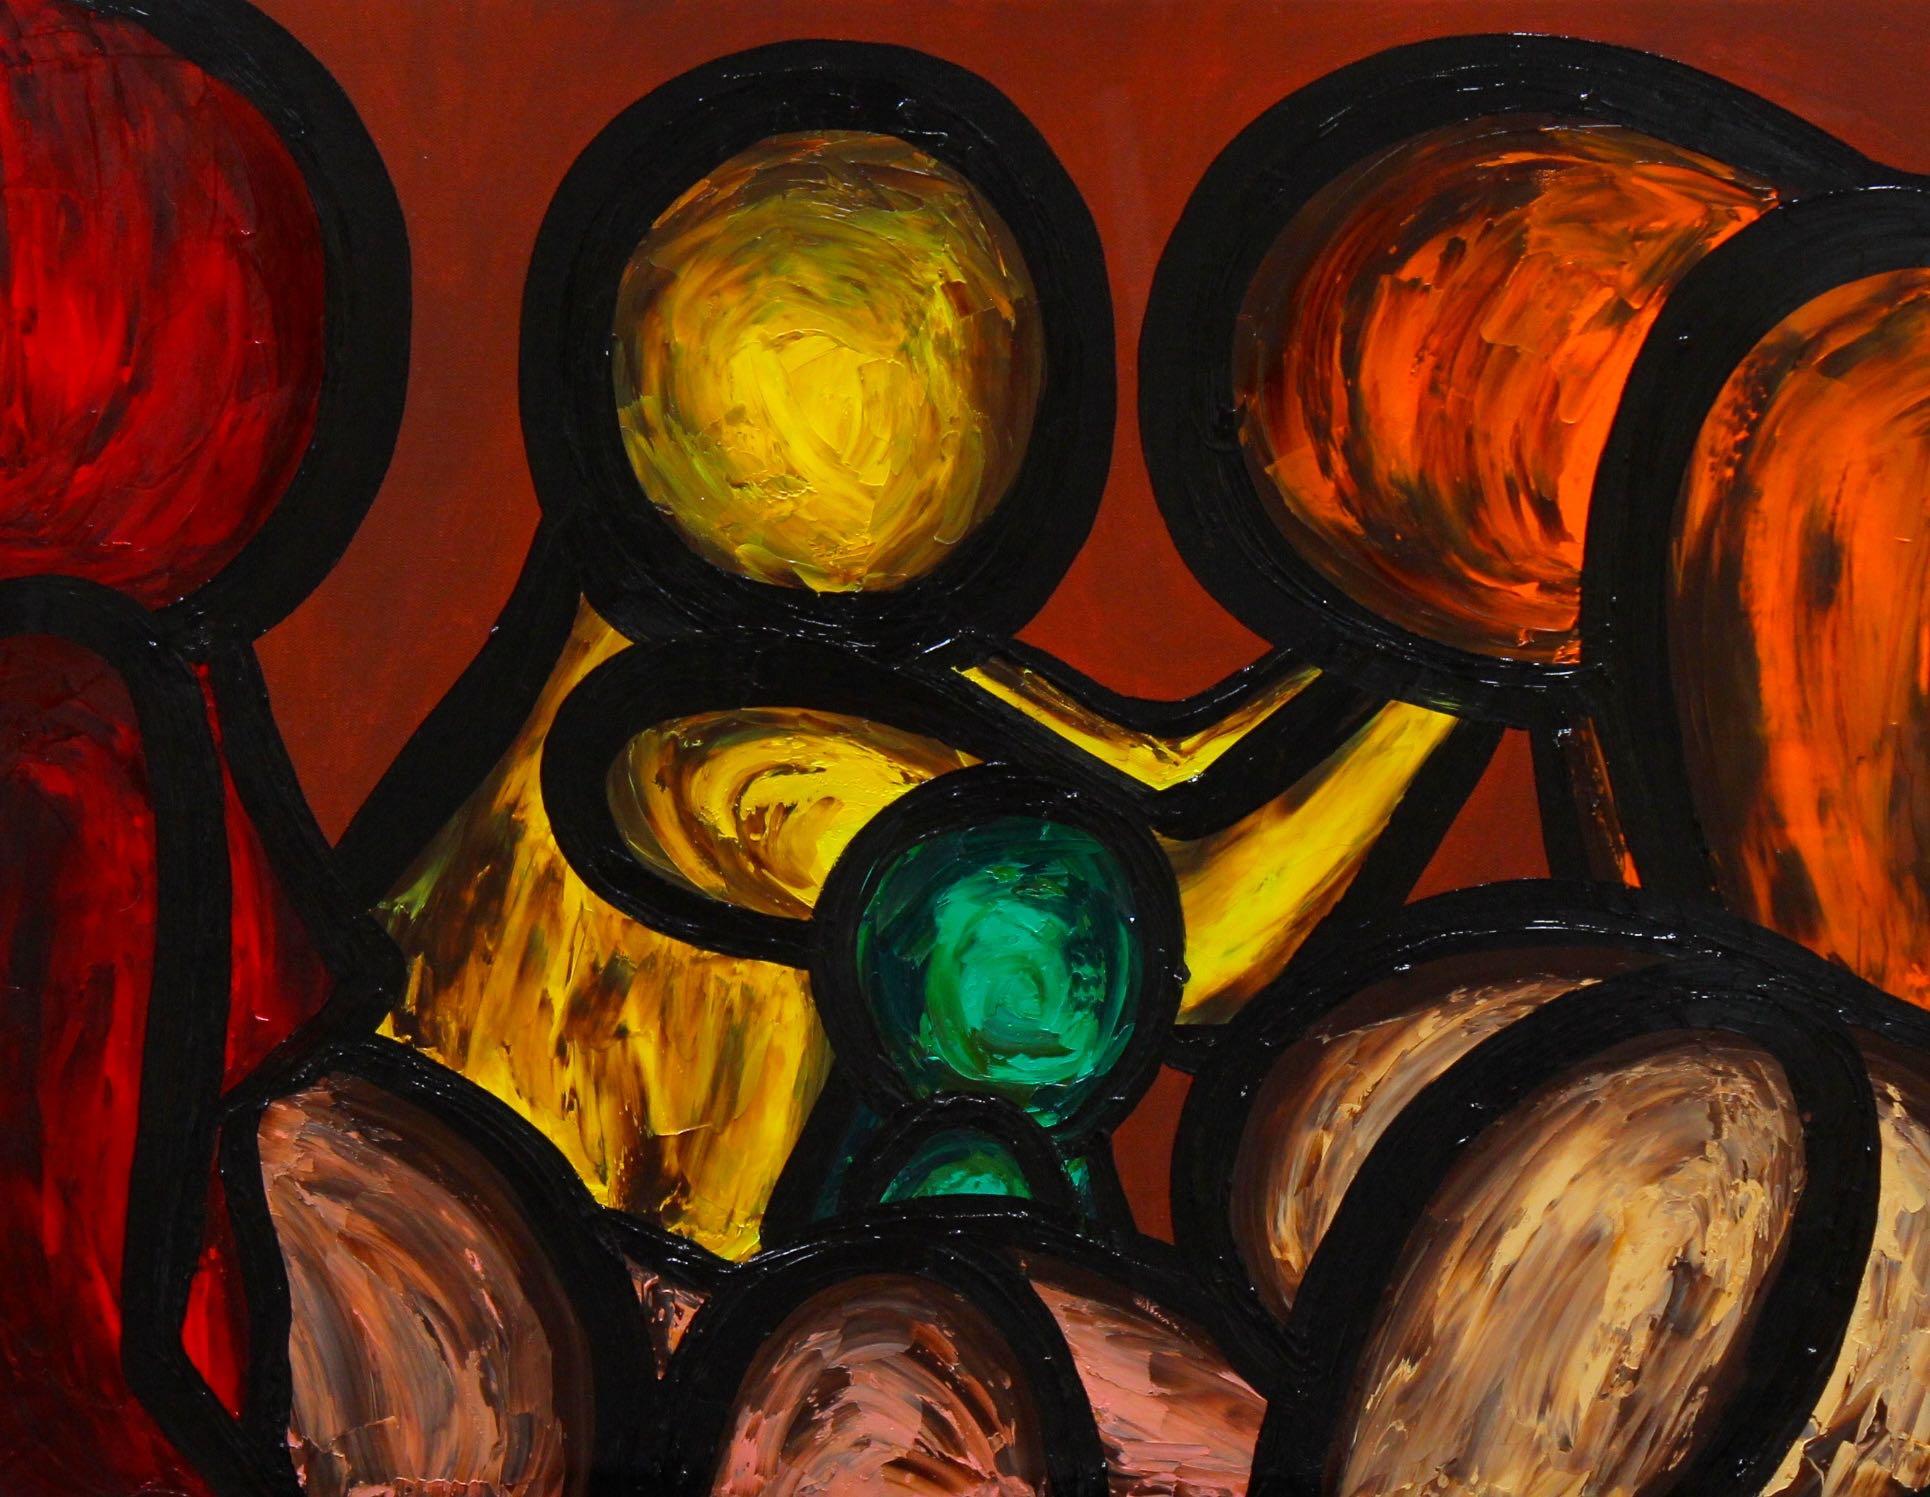 DEPARTURE artwork by FRANCESCO RUSPOLI - art listed for sale on Artplode